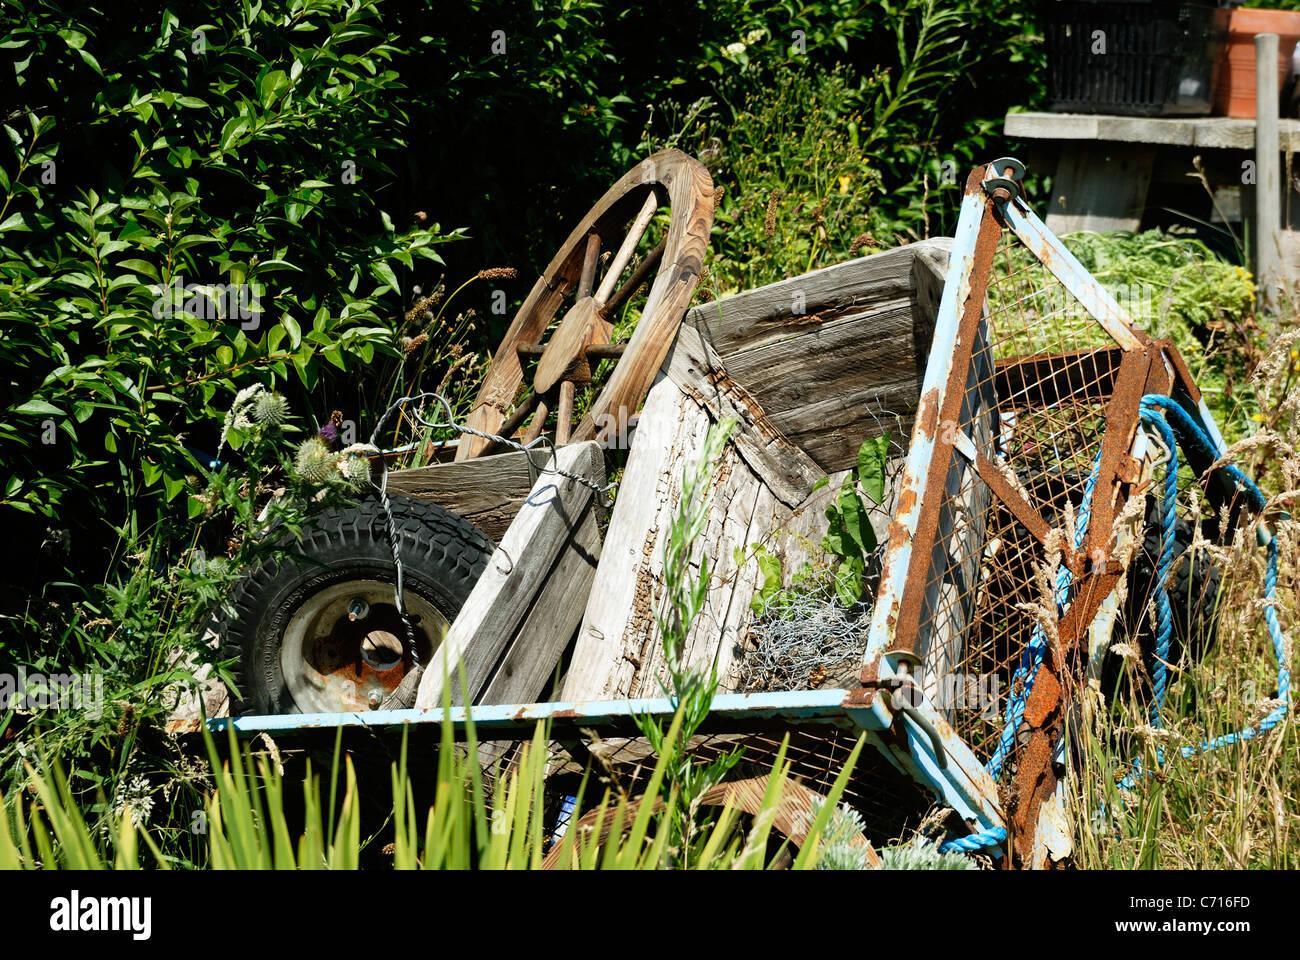 Junk in the garden - Stock Image